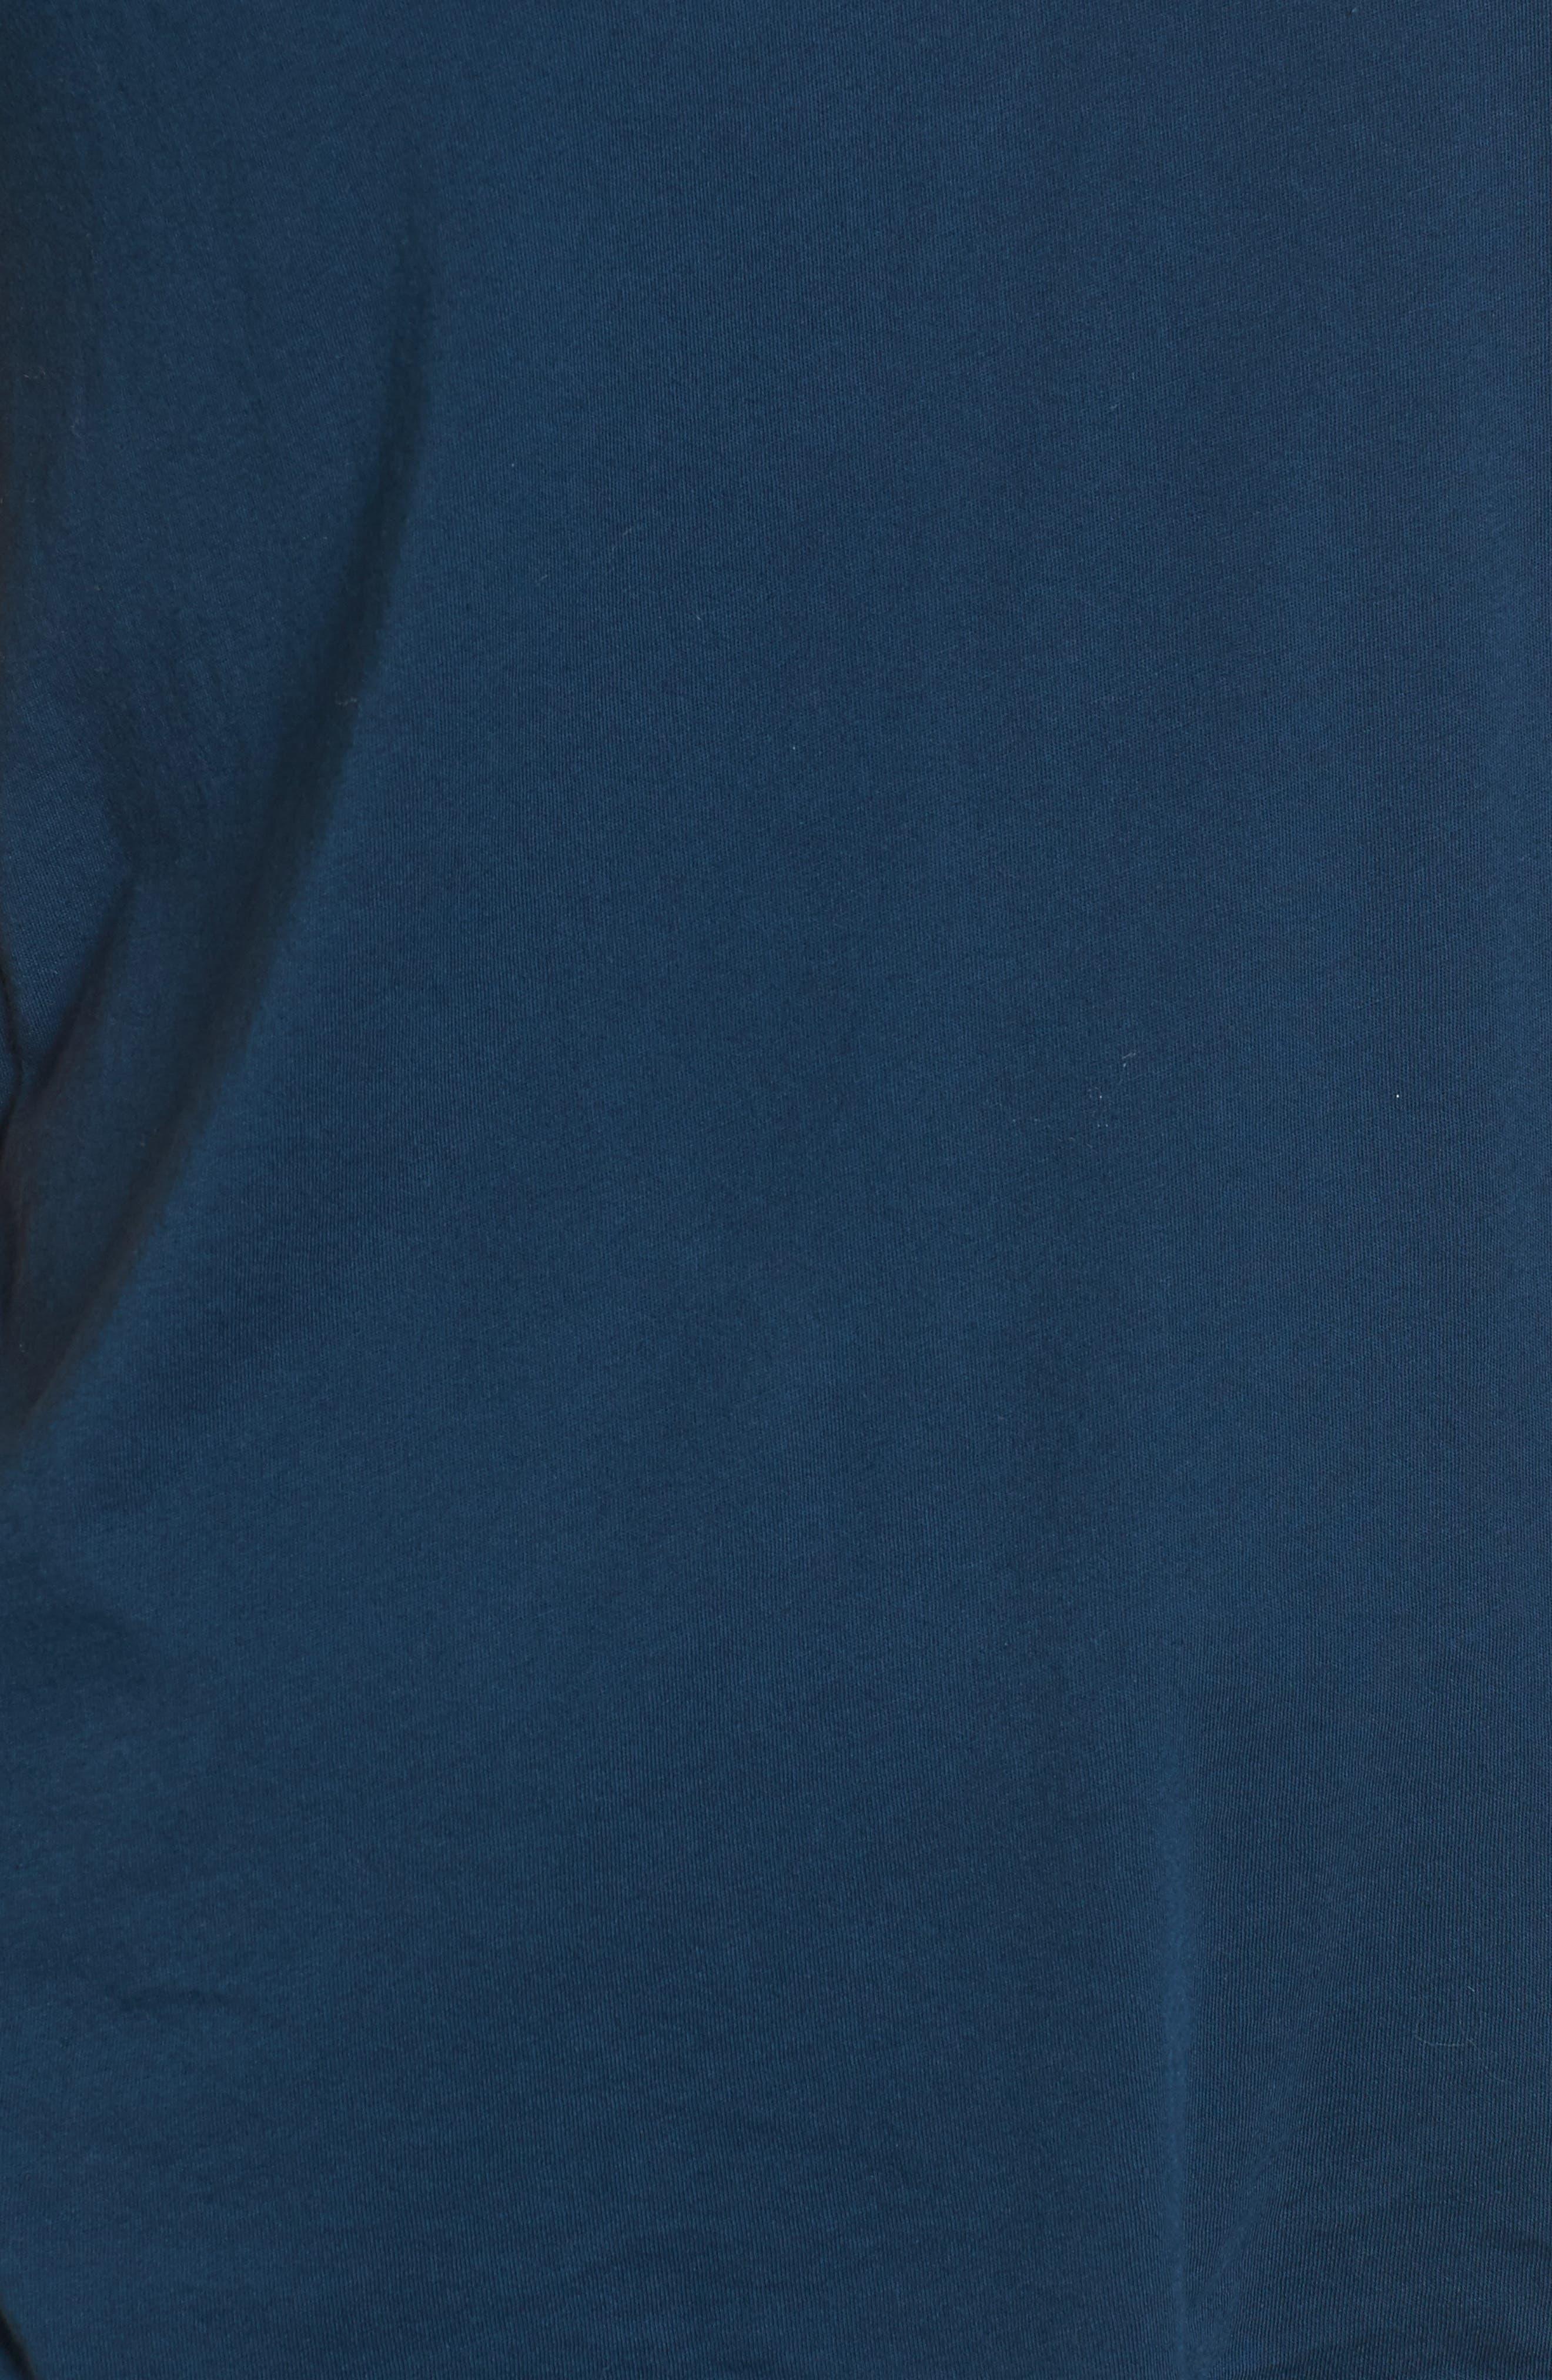 Henson Tee,                             Alternate thumbnail 154, color,